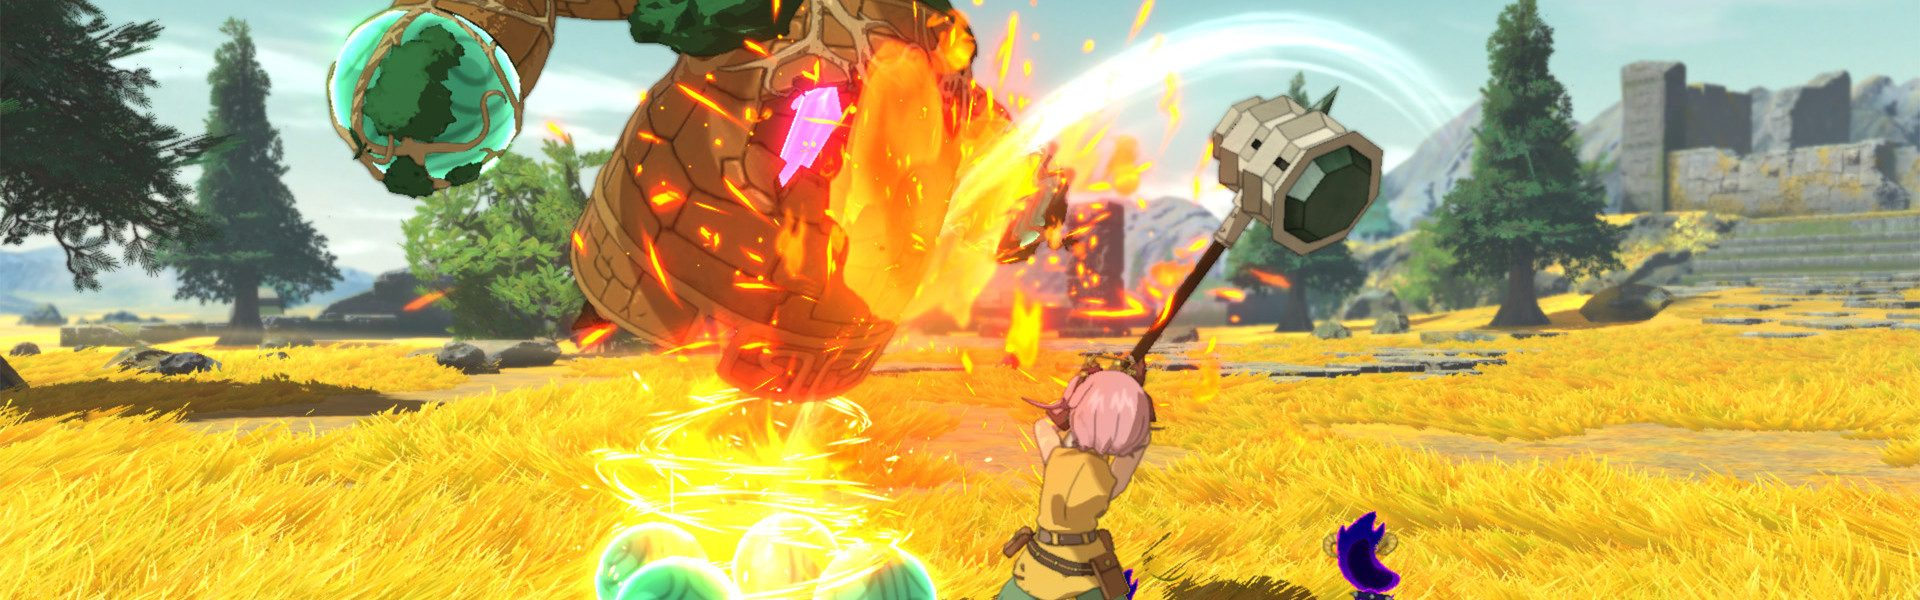 Ni No Kuni II: Revenant Kingdom The Prince's Edition Steam Key GLOBAL